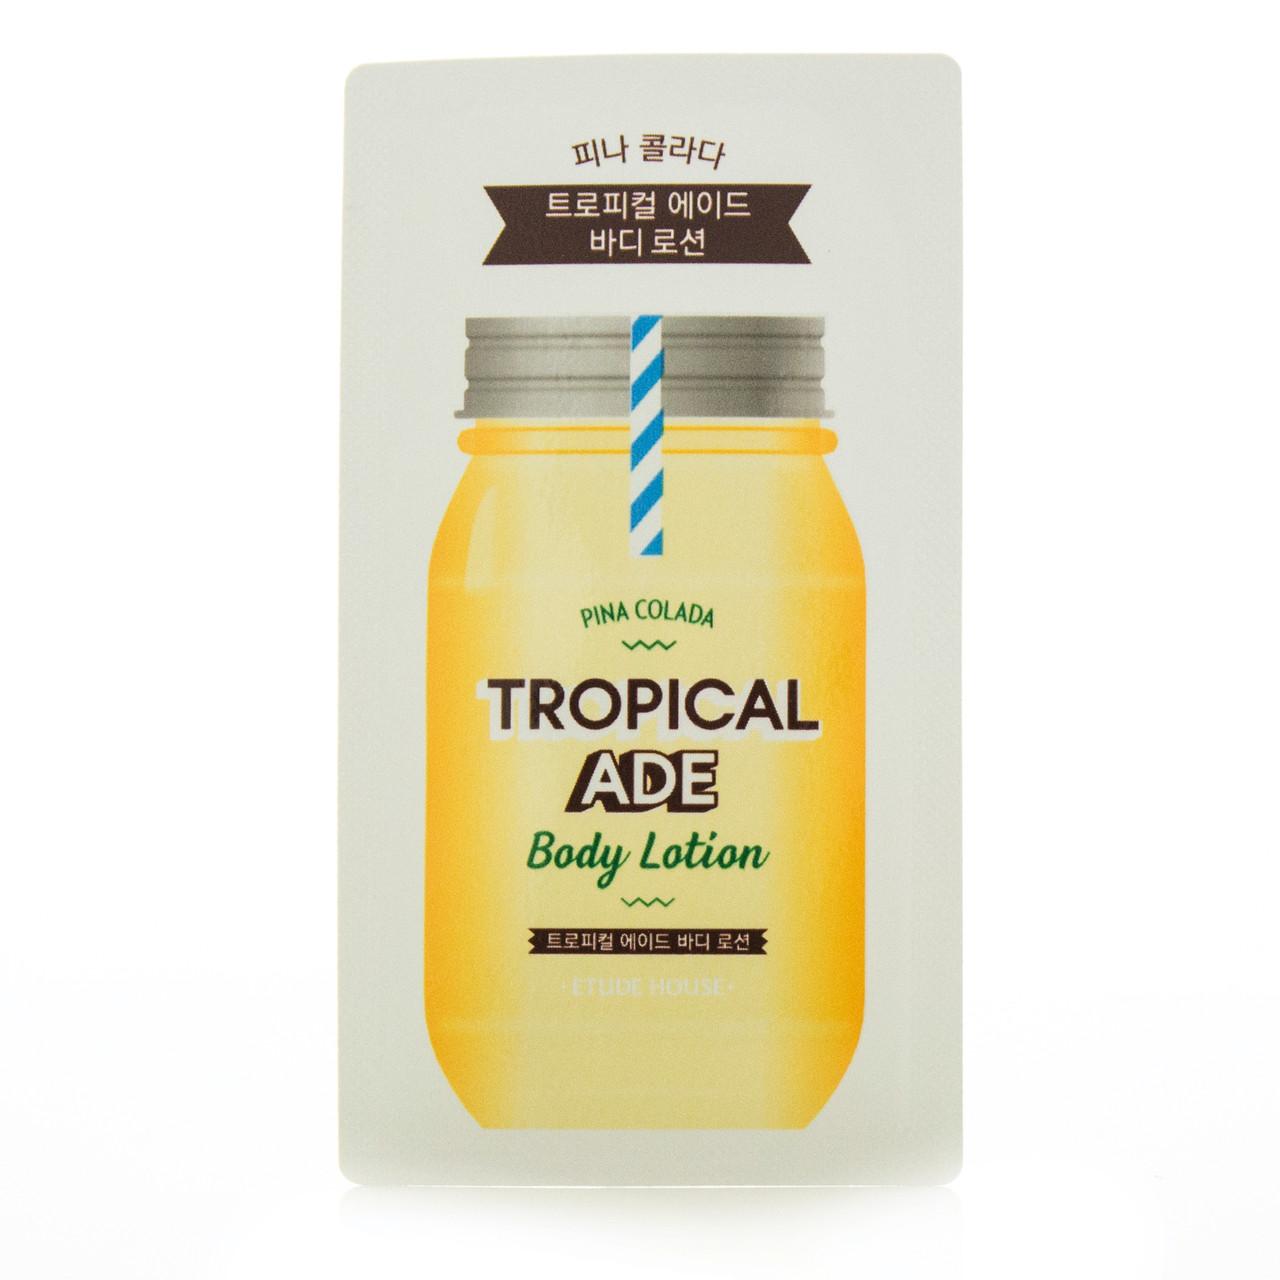 Лосьон для тела Etude House Tropical Ade Body Lotion Pina Colada